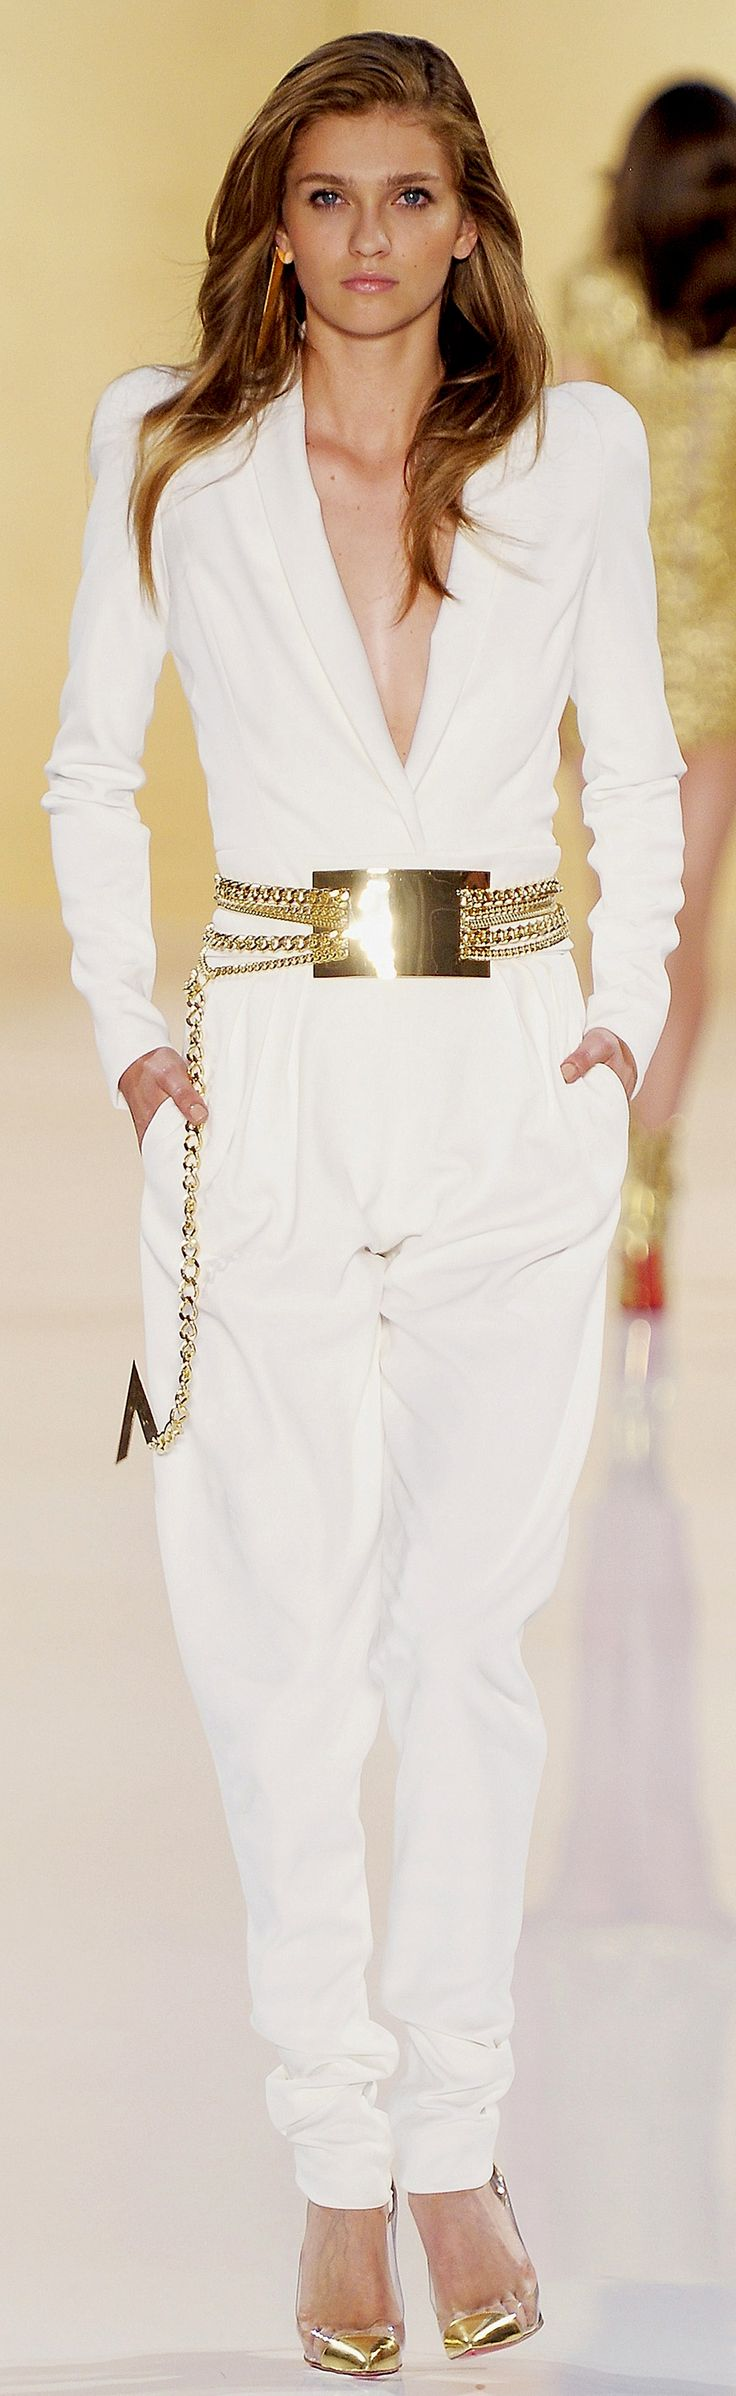 Alexandre Vautier Haute Couture FW 2013